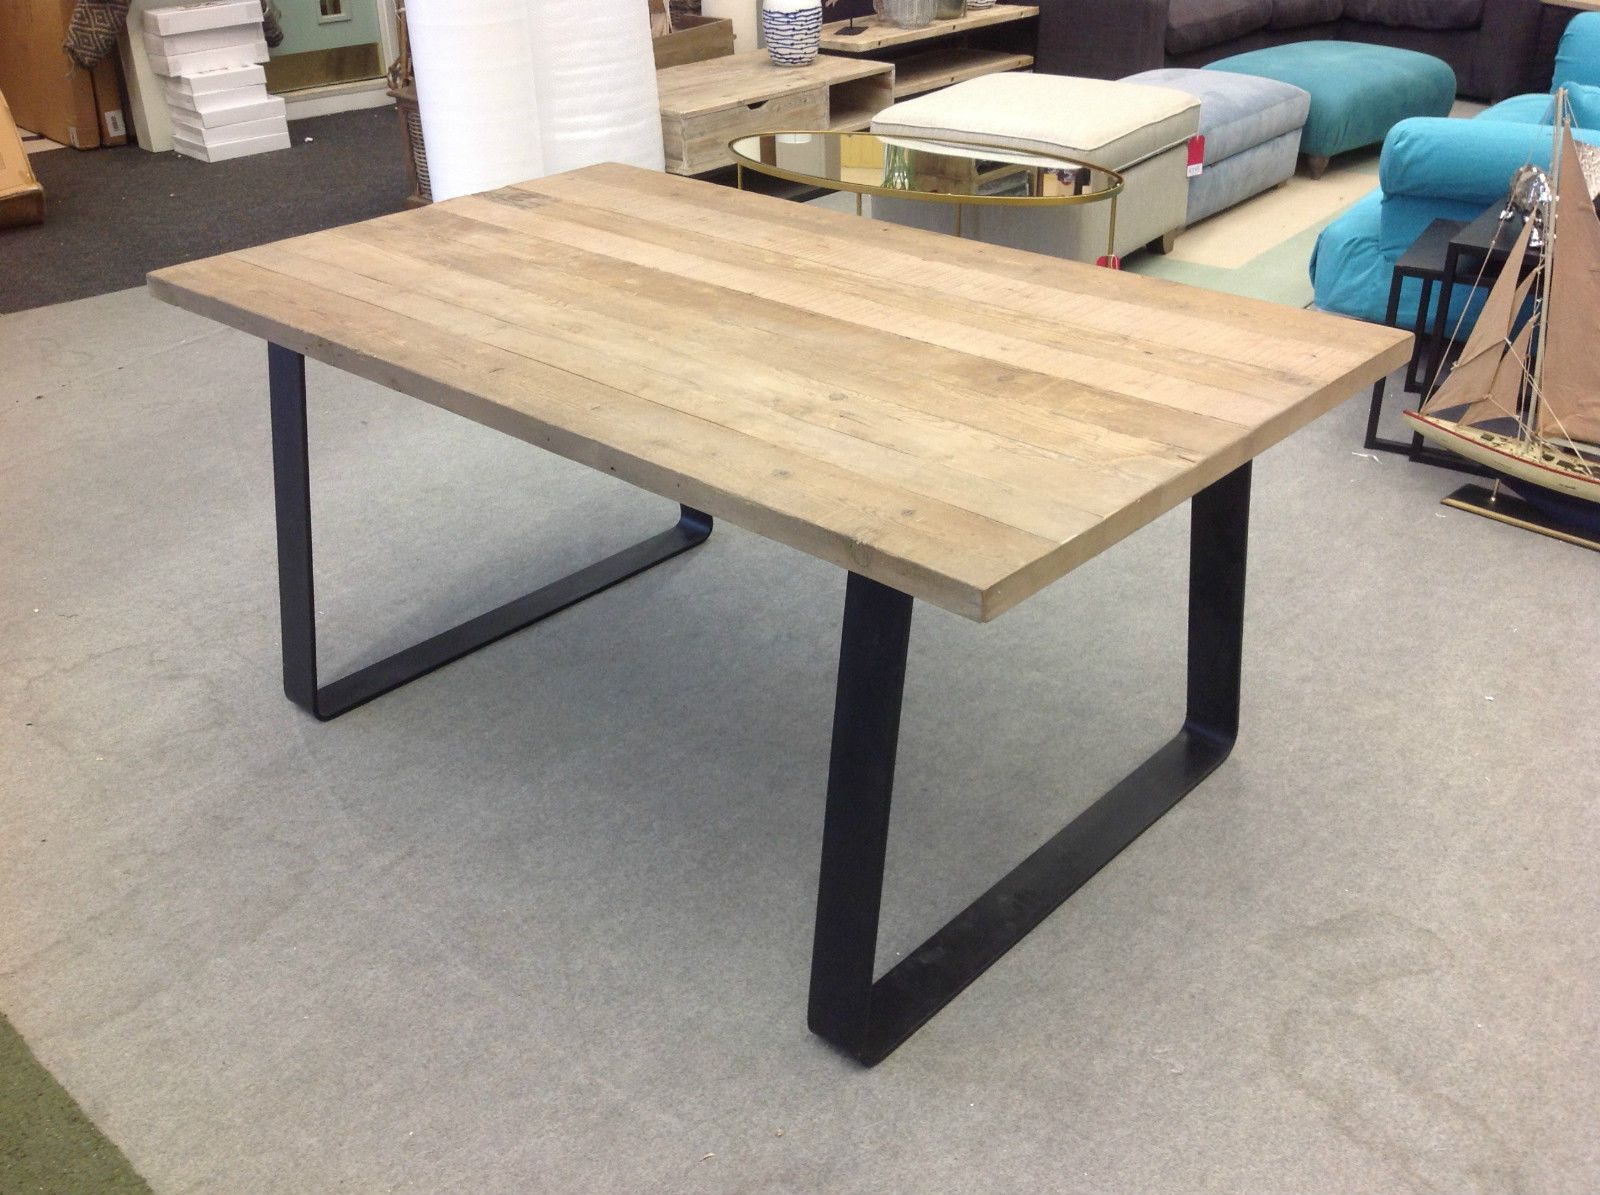 industrial diy furniture. Designer Brand Industrial Style Reclaimed Timber Top Dining Table (medium) Diy Furniture S